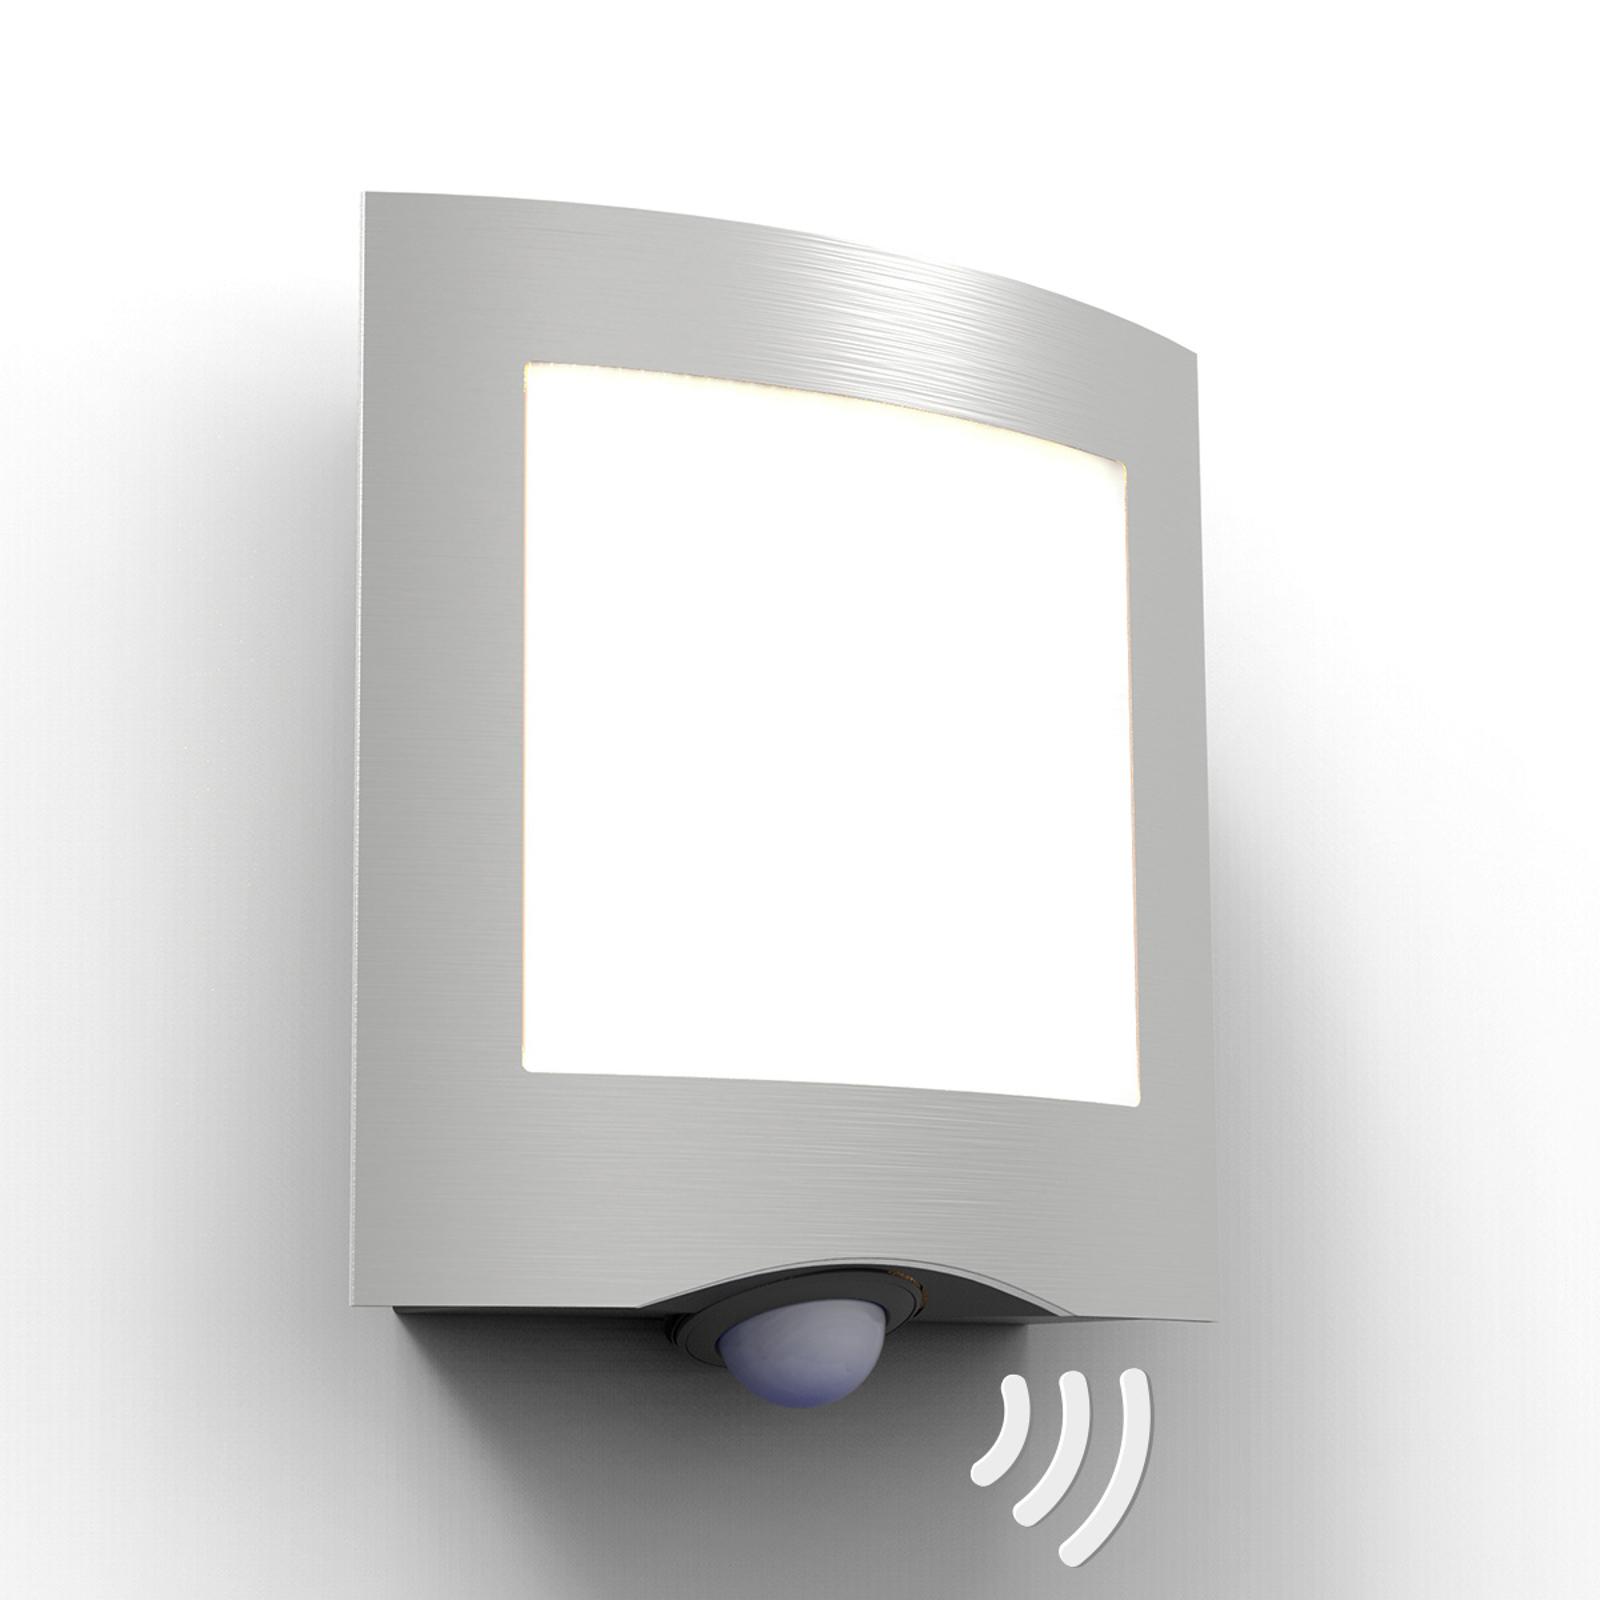 LED-Außenwandleuchte Farell, Edelstahl mit Sensor